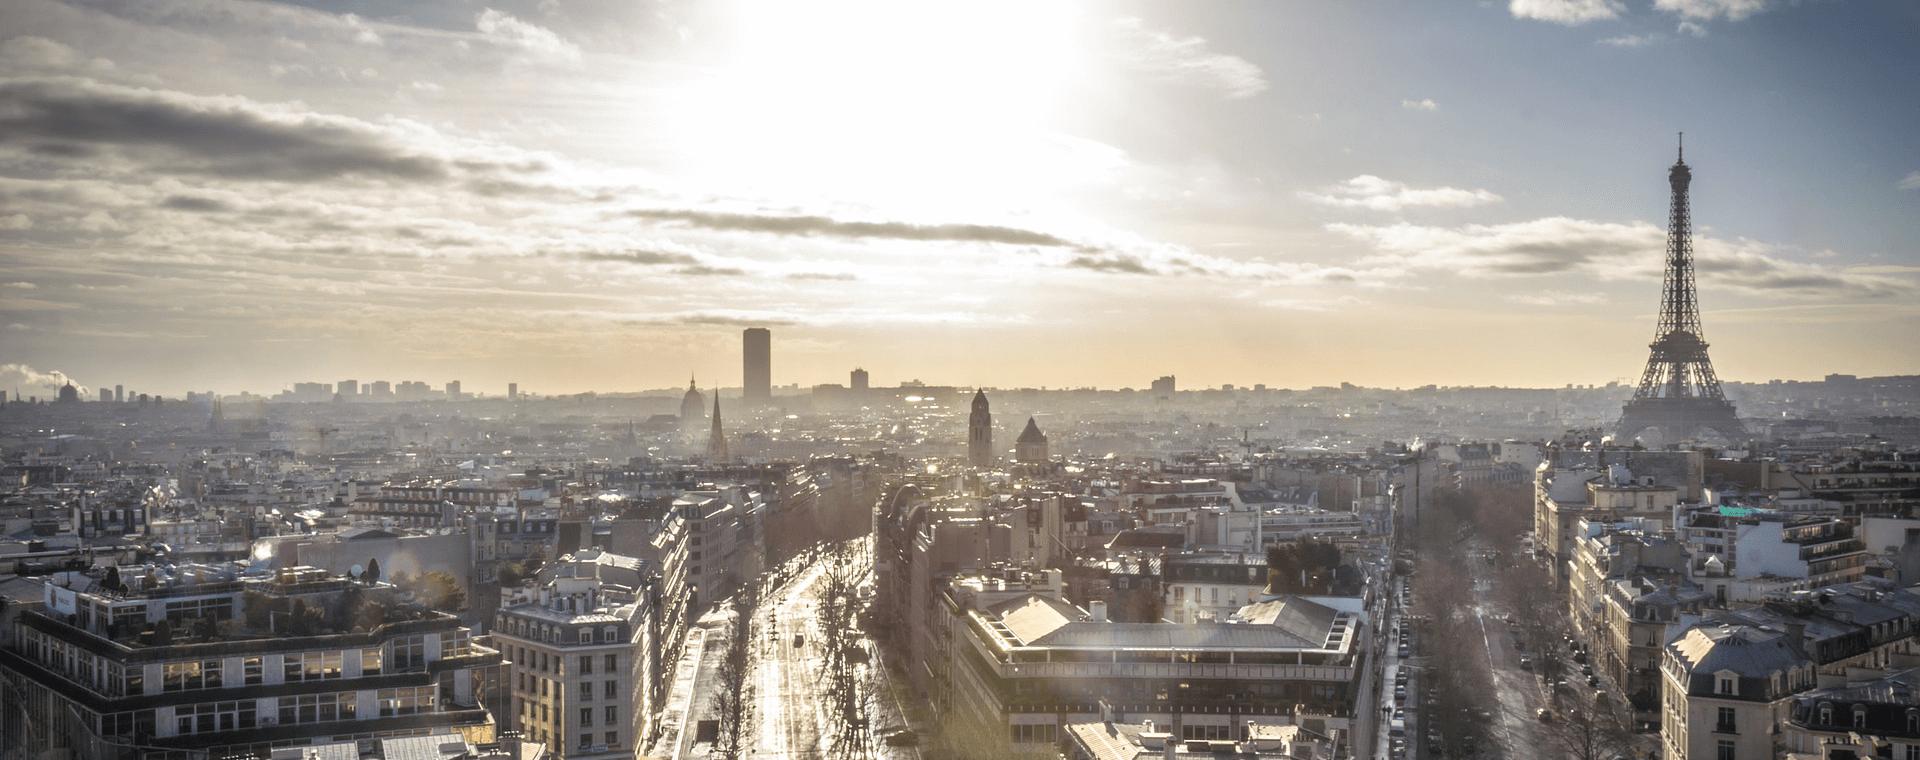 Zagreb Pariz 2019, Pariz, Duborvnik, Split, Putovanja za parove, Romantična putovanja